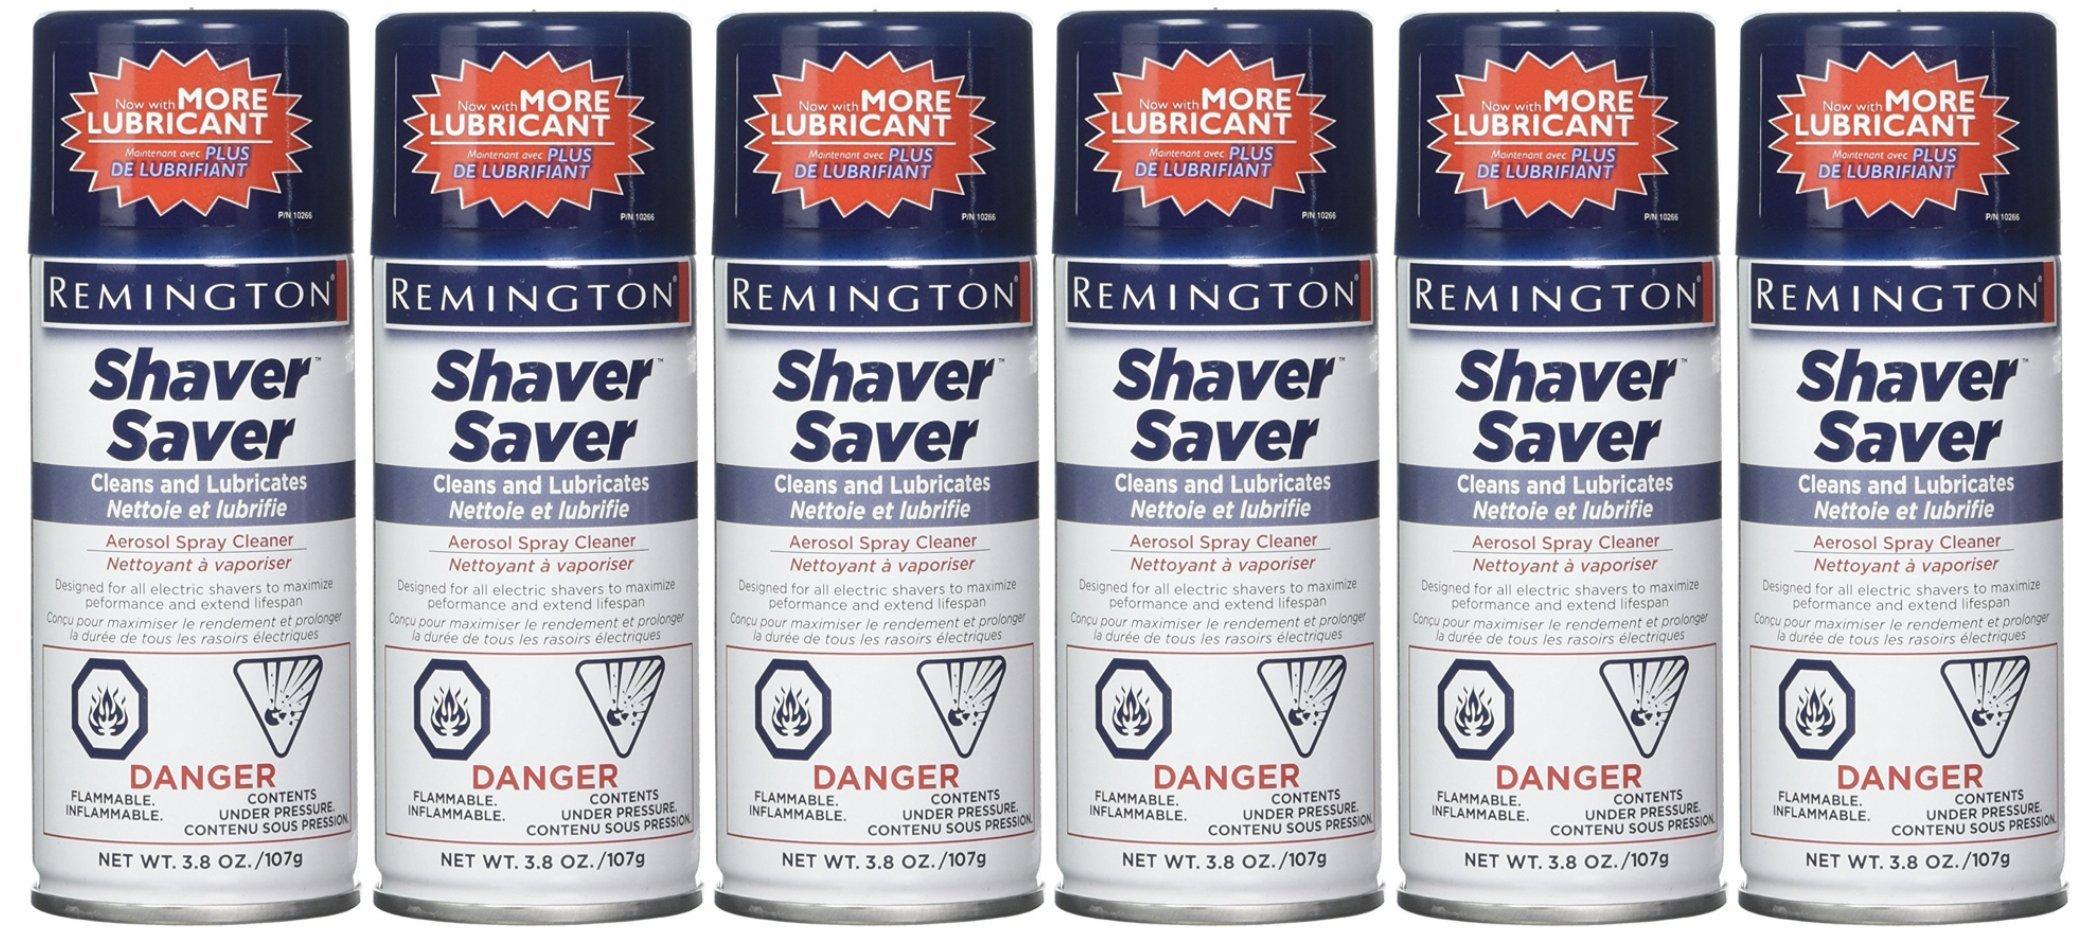 Remington Shaver Saver Aerosol spray Cleaner , Model SP-4 3.8 oz (Quantity of 6)